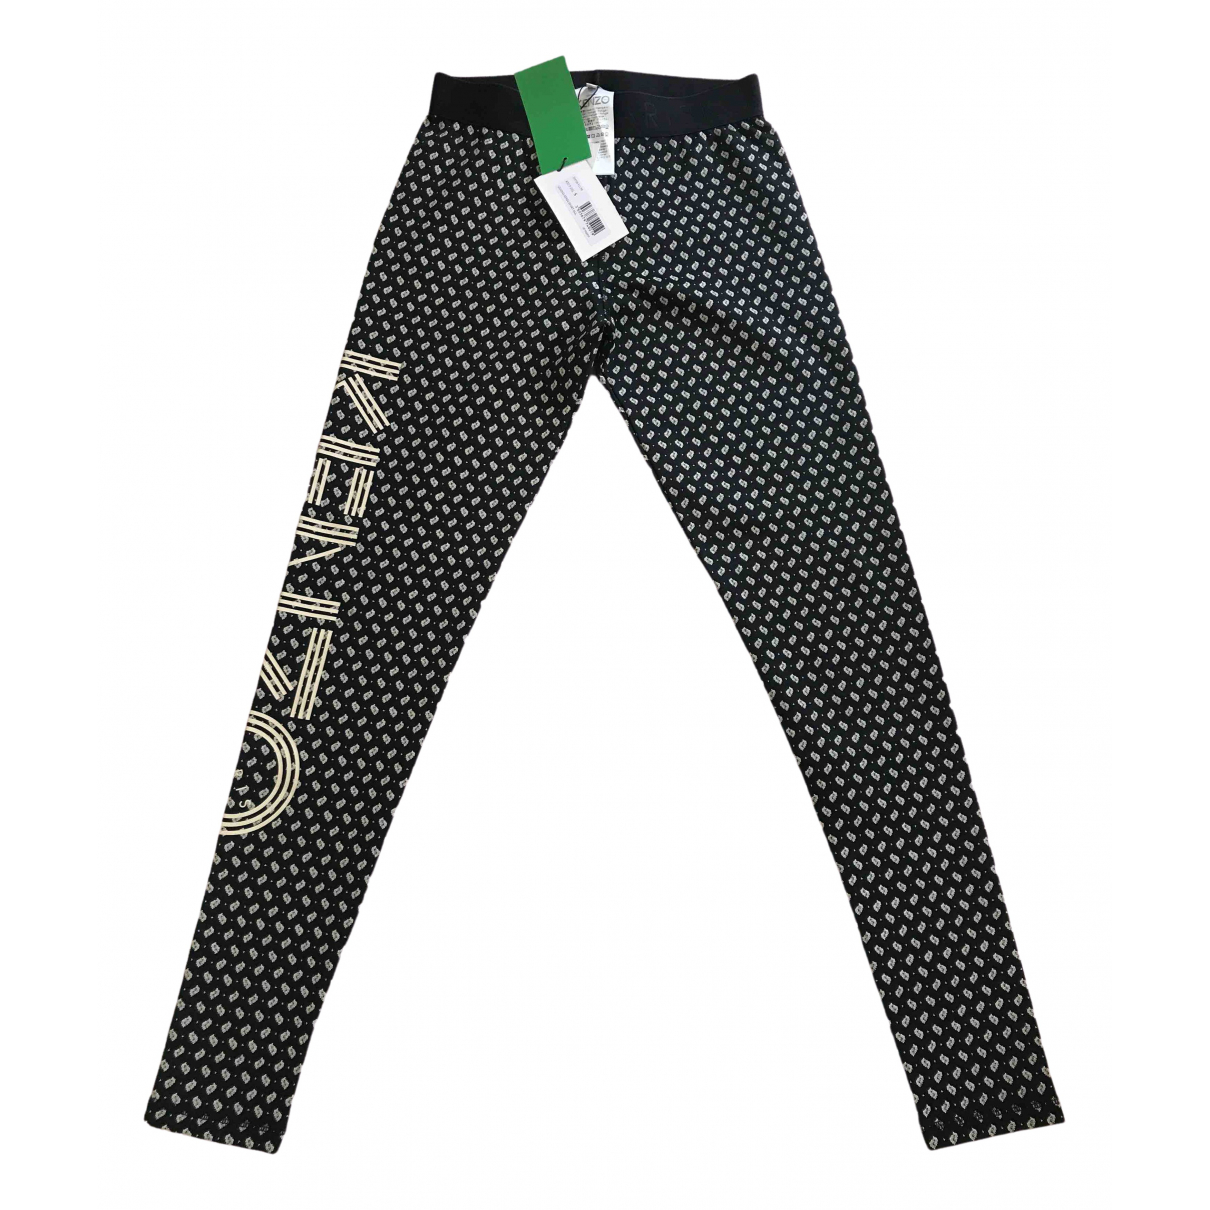 Kenzo \N Black Cotton Trousers for Women S International